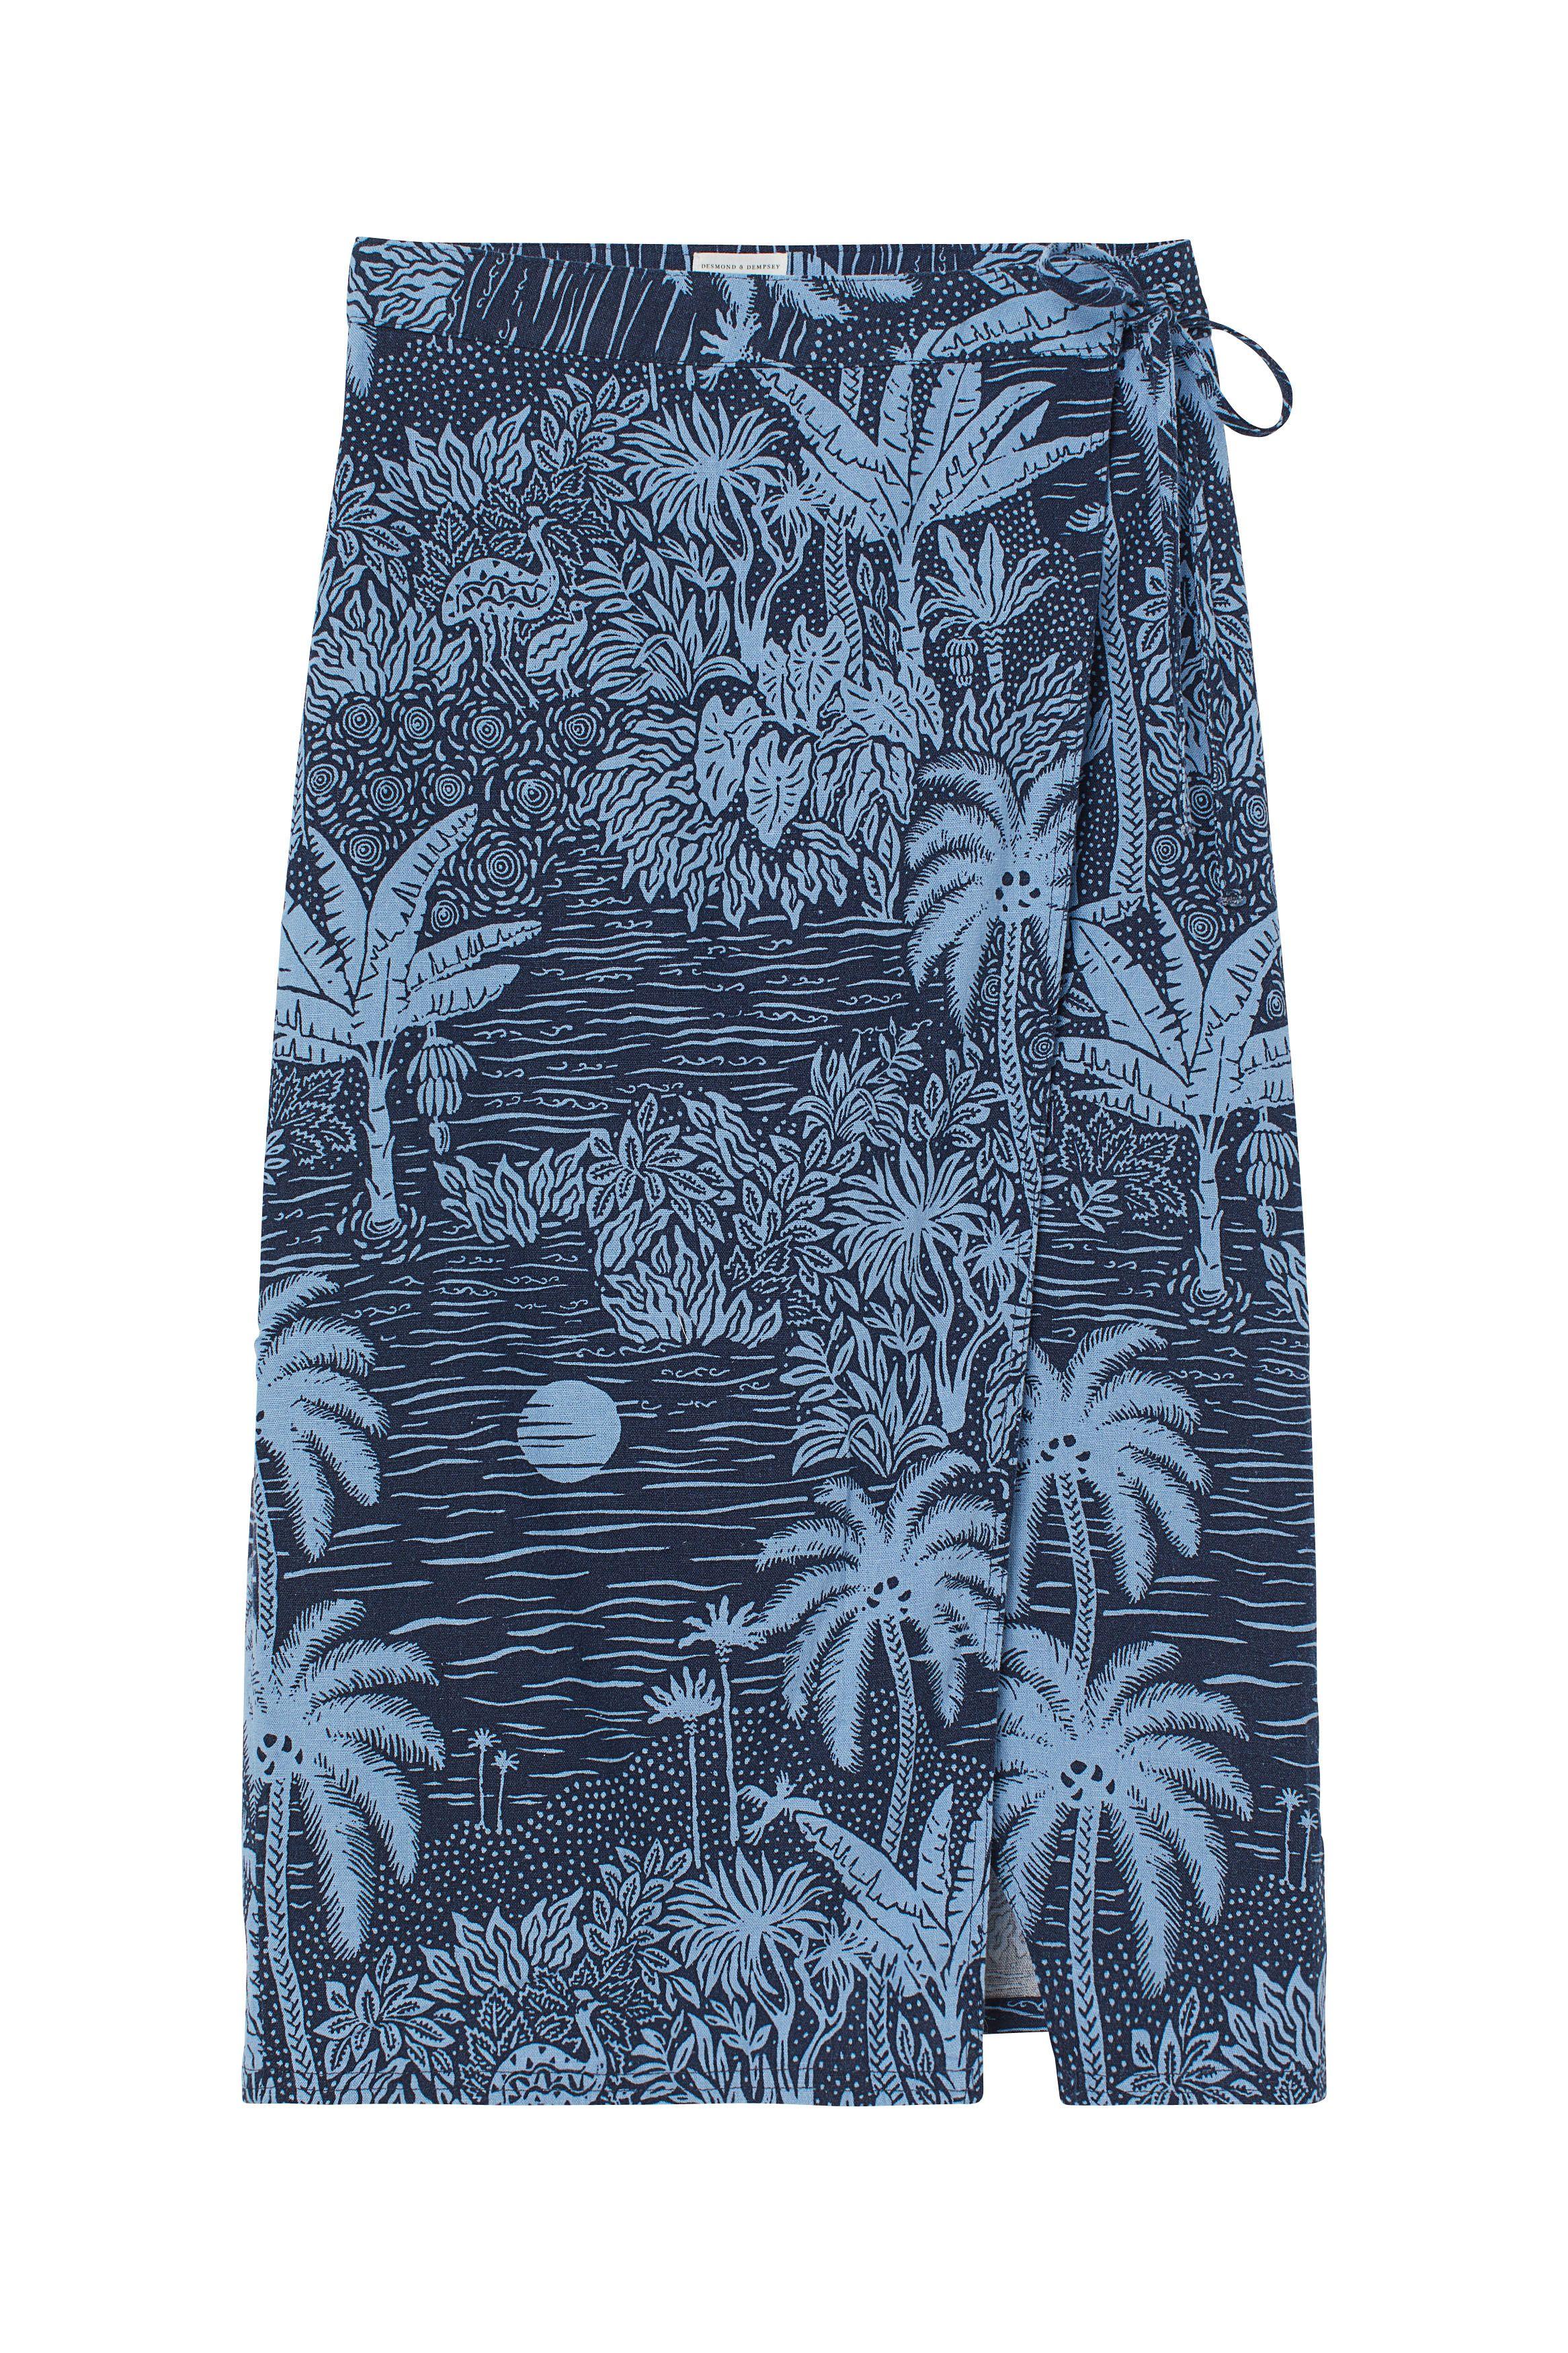 IW RRP £18 Next Escape Reality Cotton Pyjama Trousers